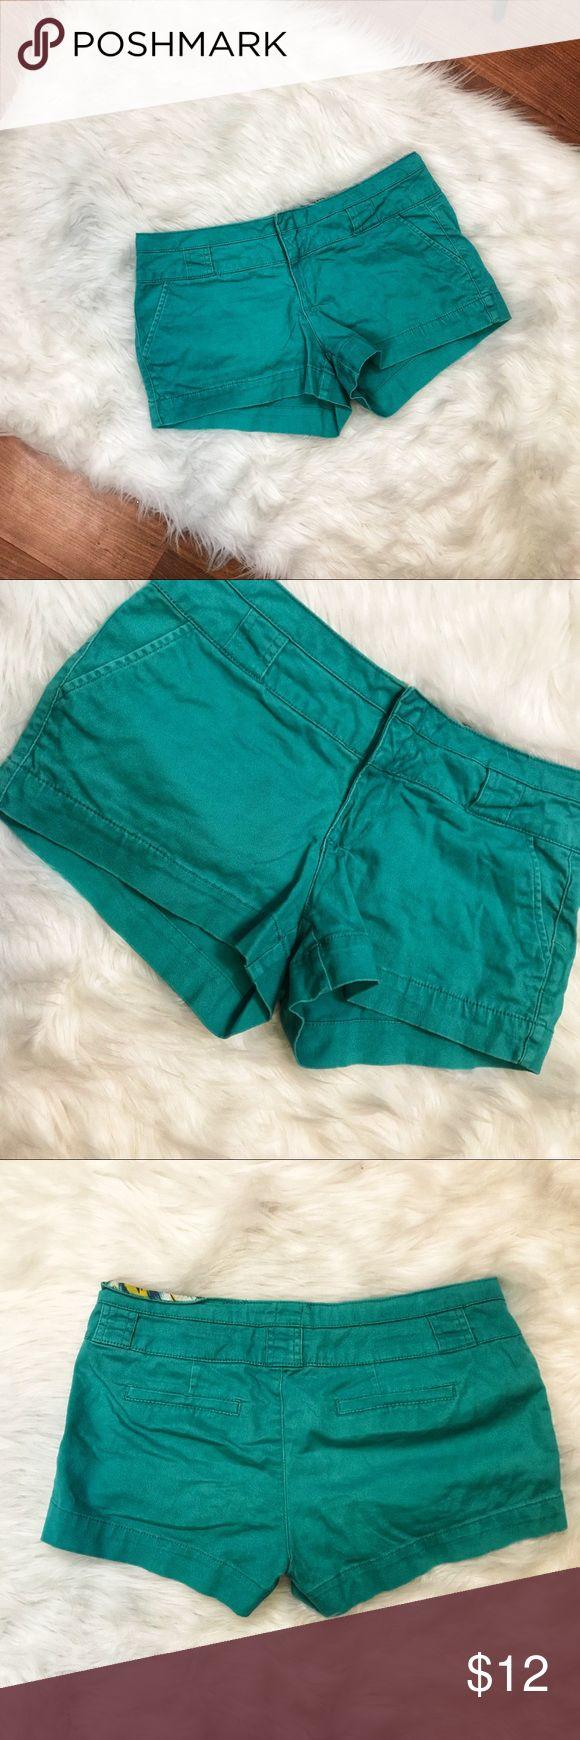 2b Bebe Aqua Shorts Size 8 Classic shorts from 2b Bebe (outlet) - Size 8 / Waist 15.5 / Rise 7 / Inseam 2.5 - Aqua / Back Faux Pockets 2B Bebe Shorts